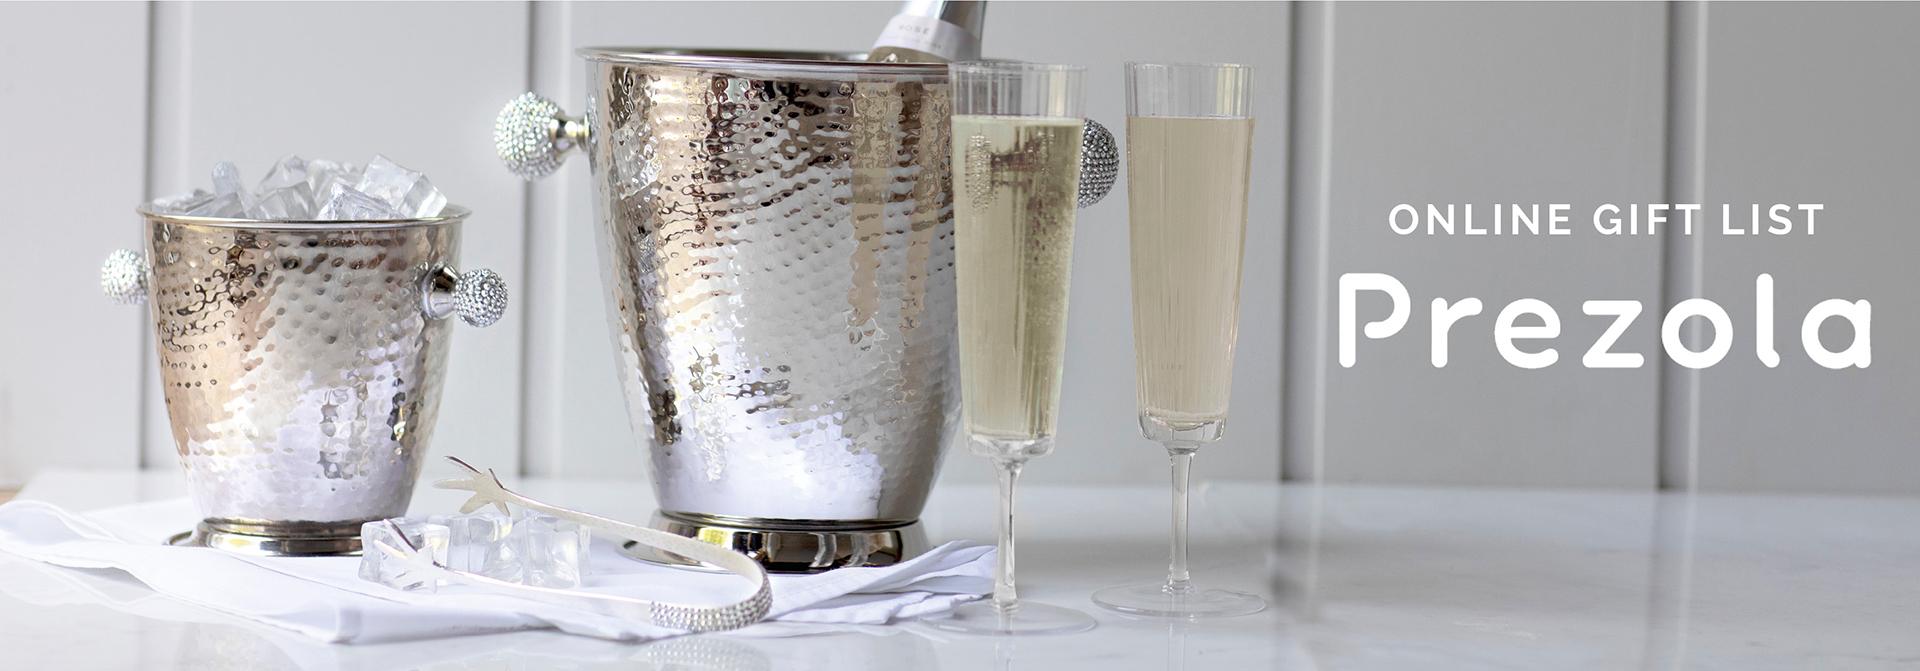 Prezola Wedding Gift List Services